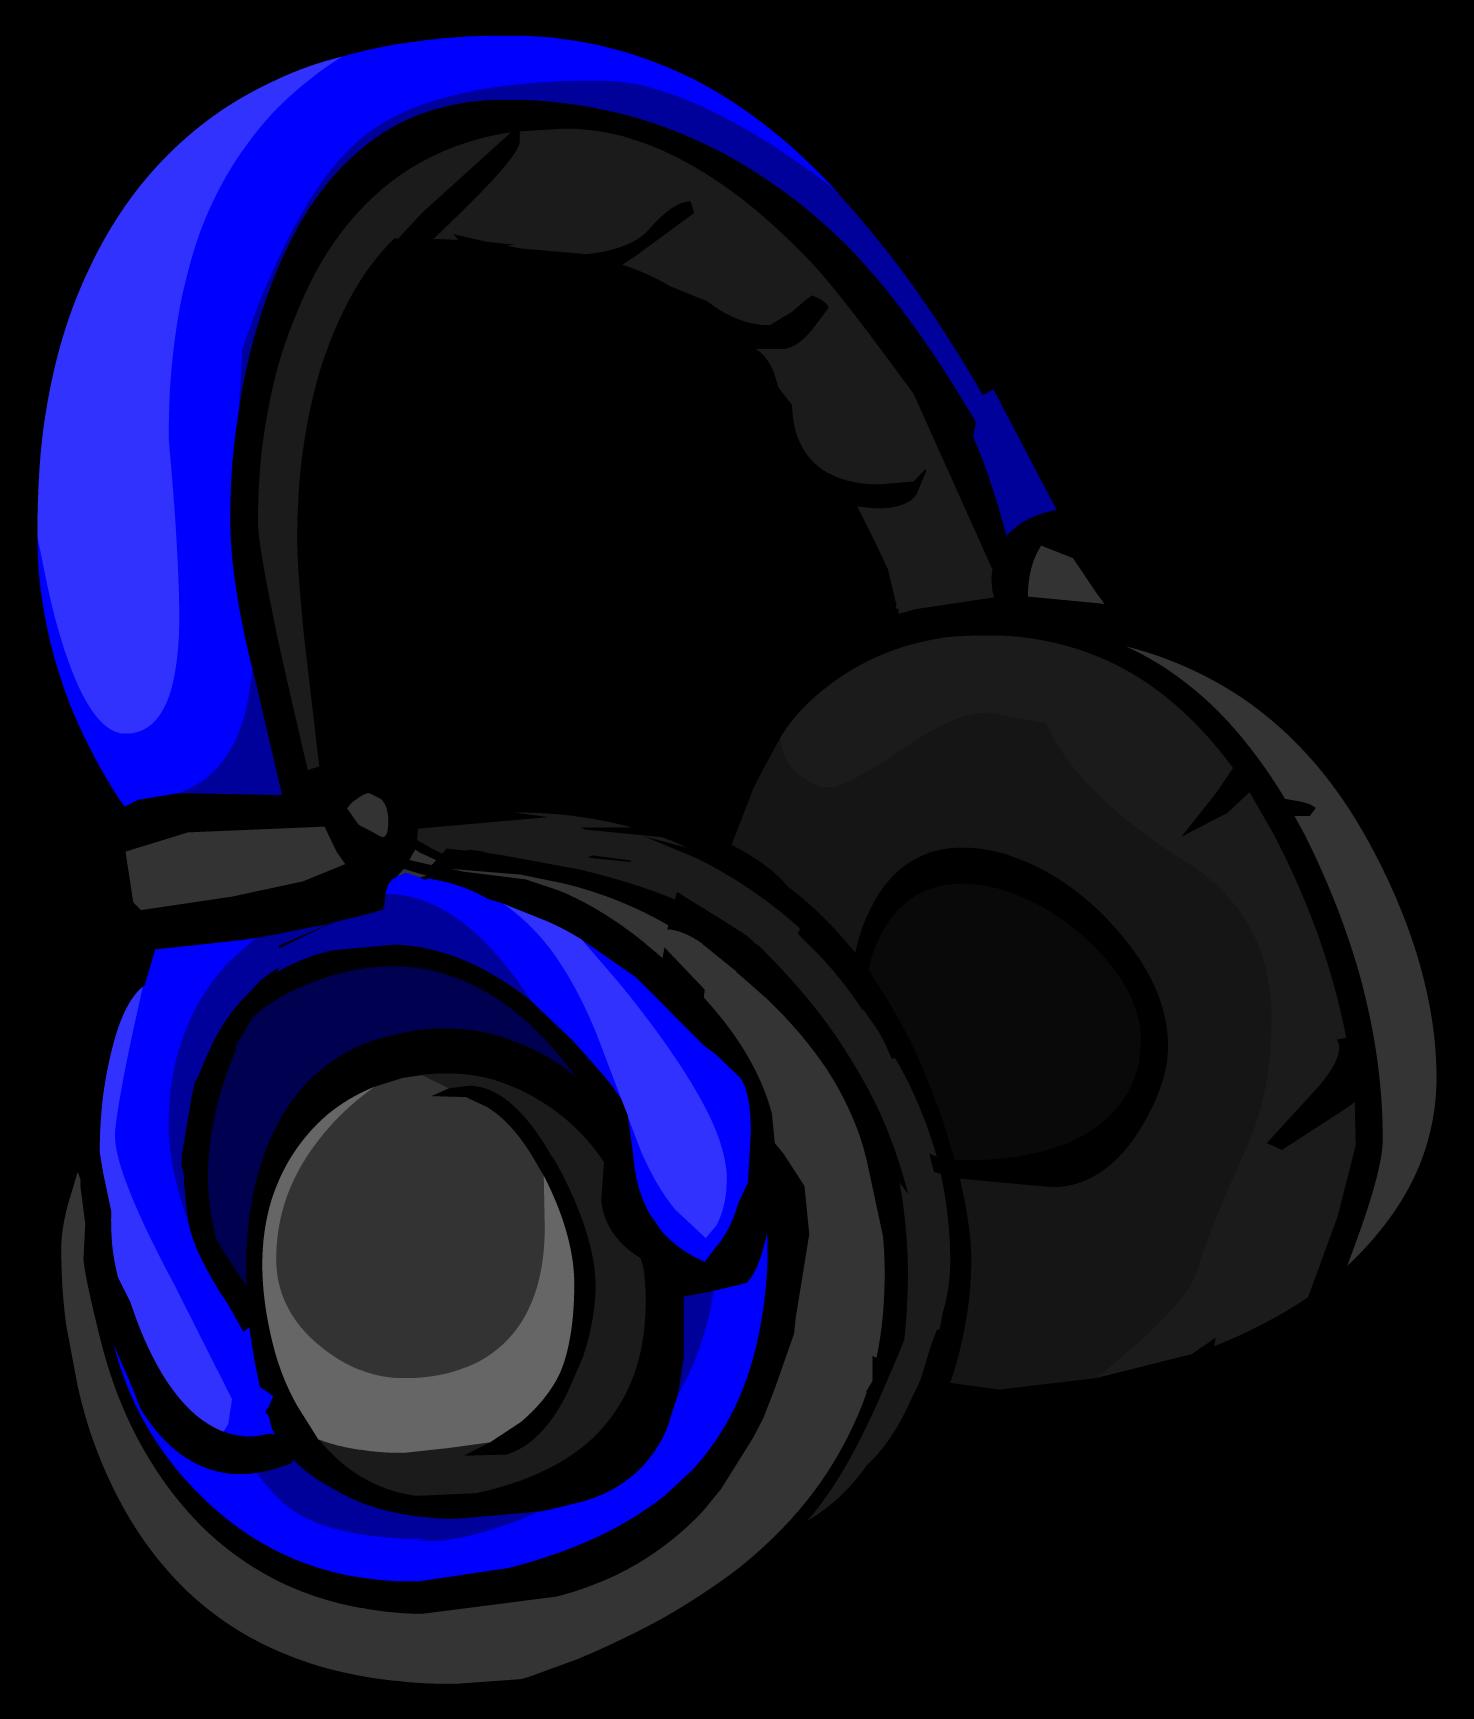 Headphones clipart cool headphone. Image blueheadphones png club